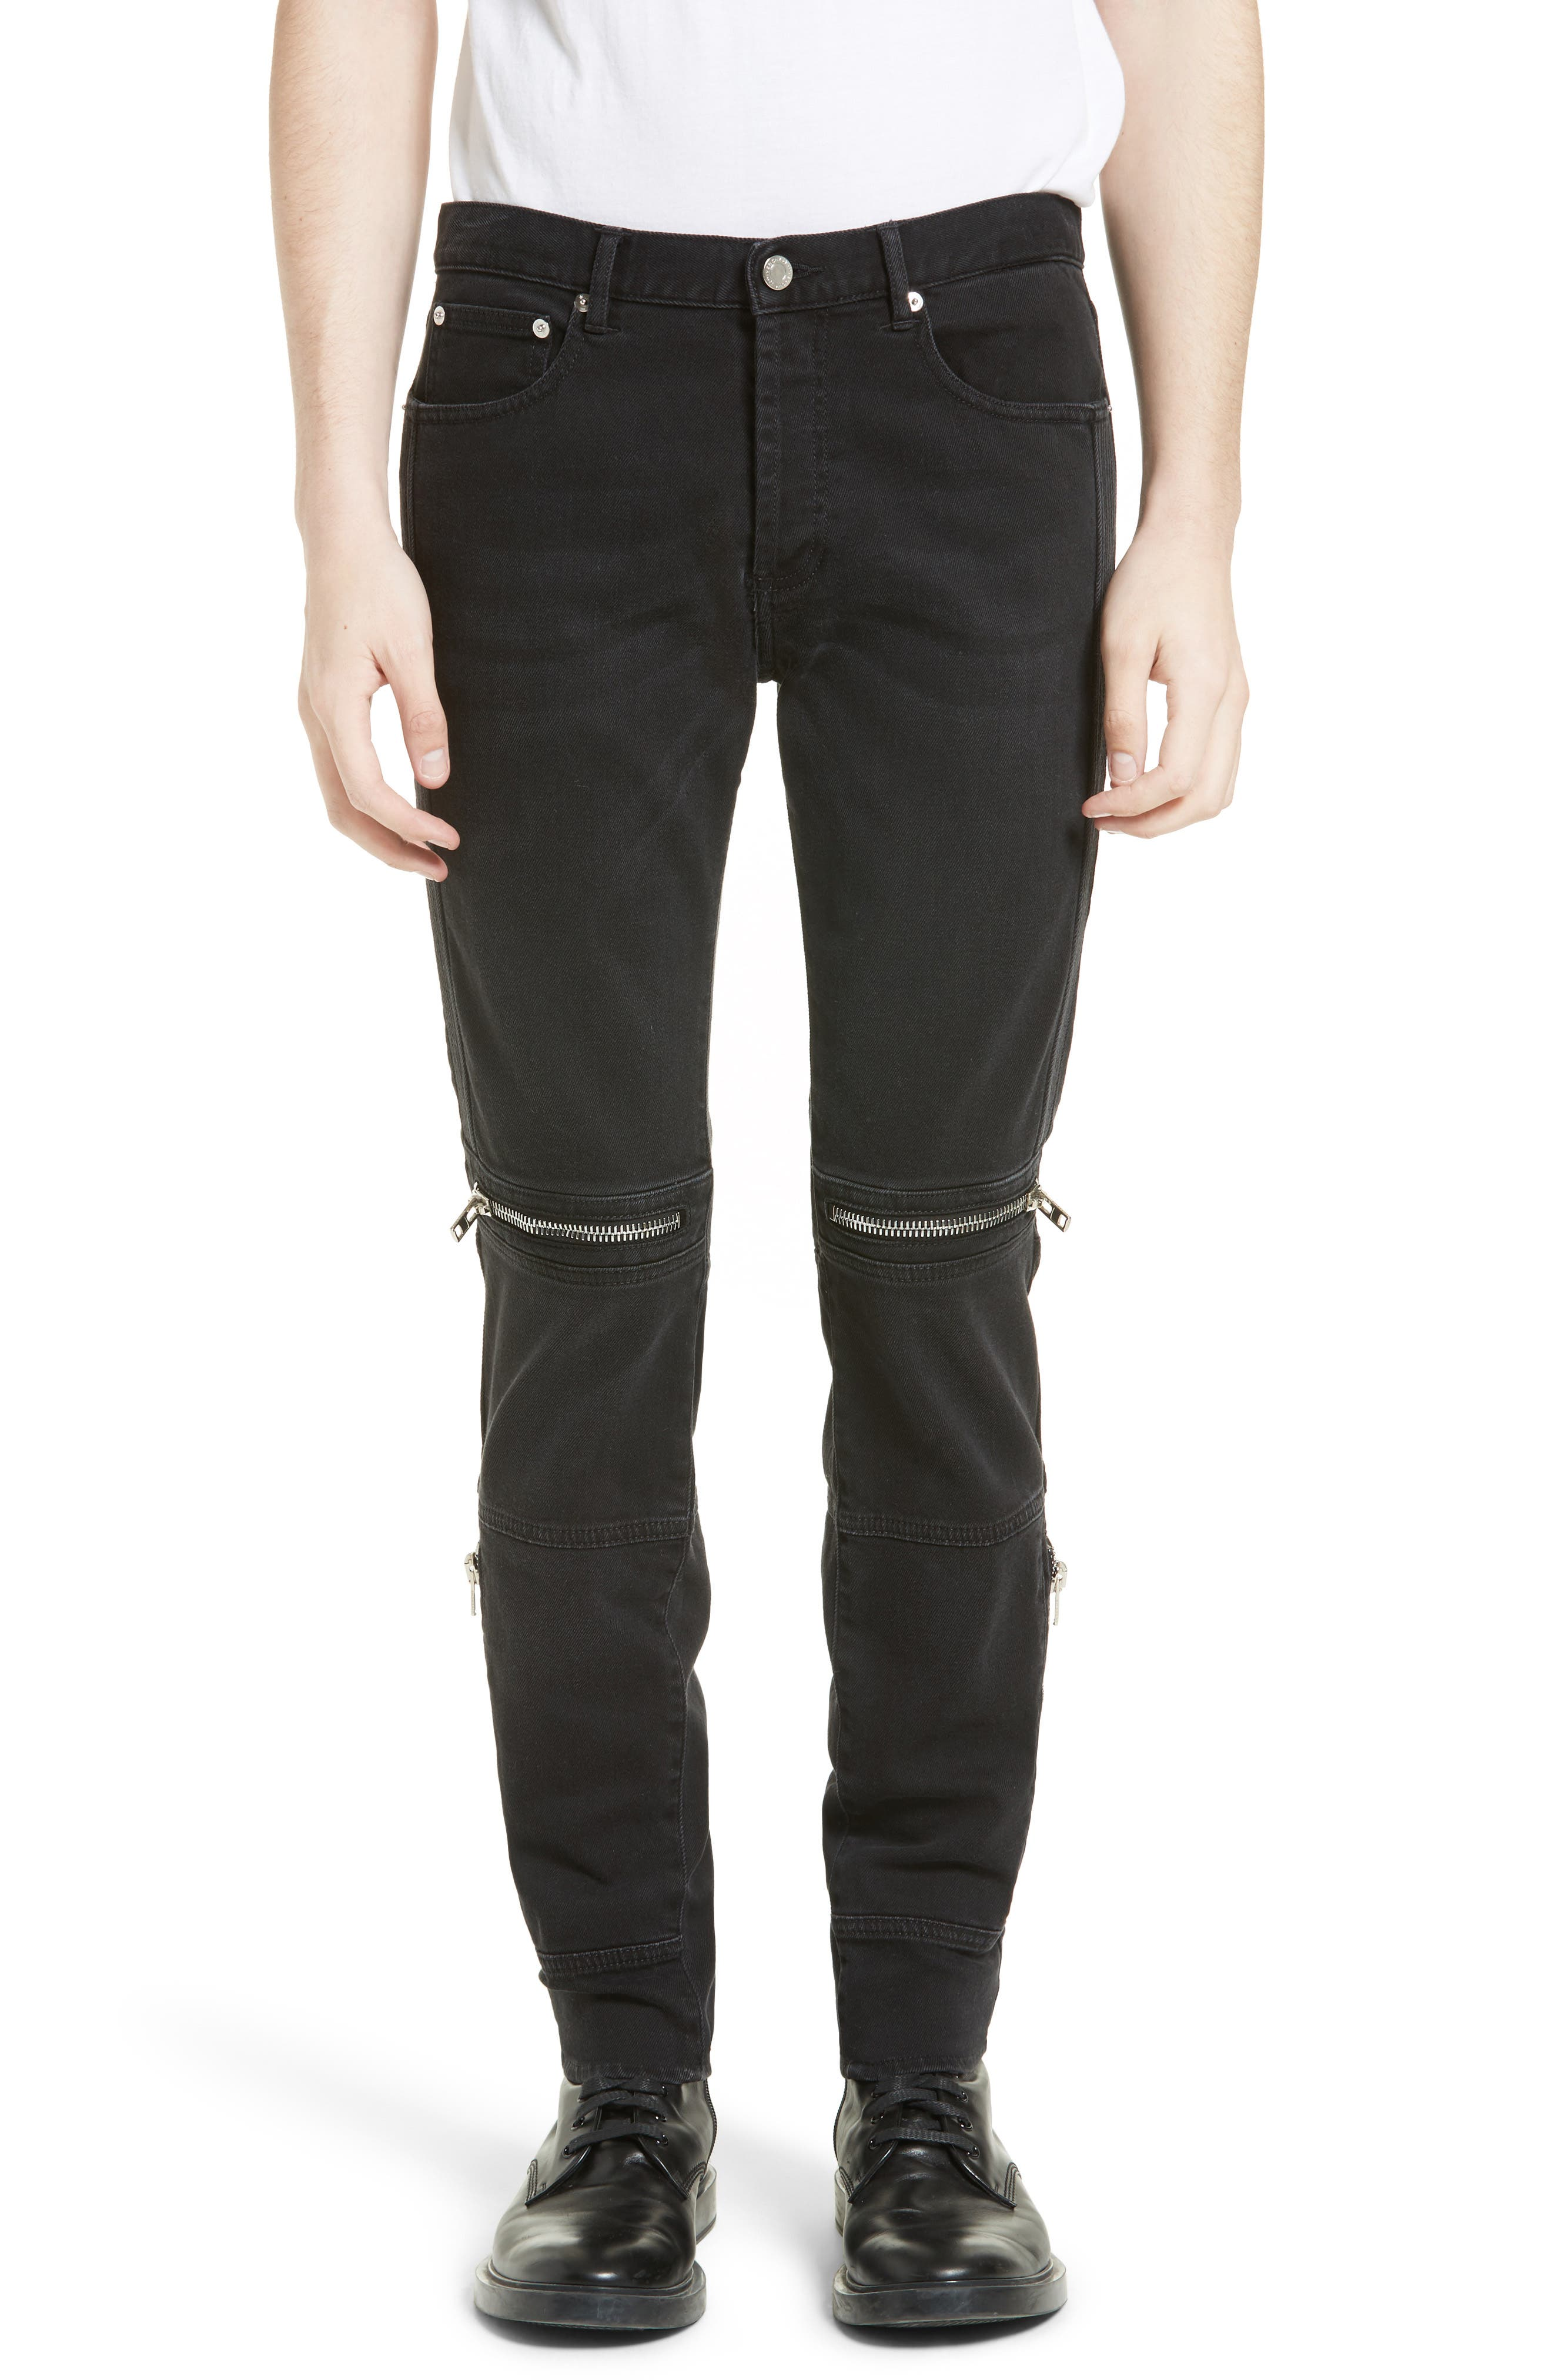 Givenchy Vintage Style Biker Jeans